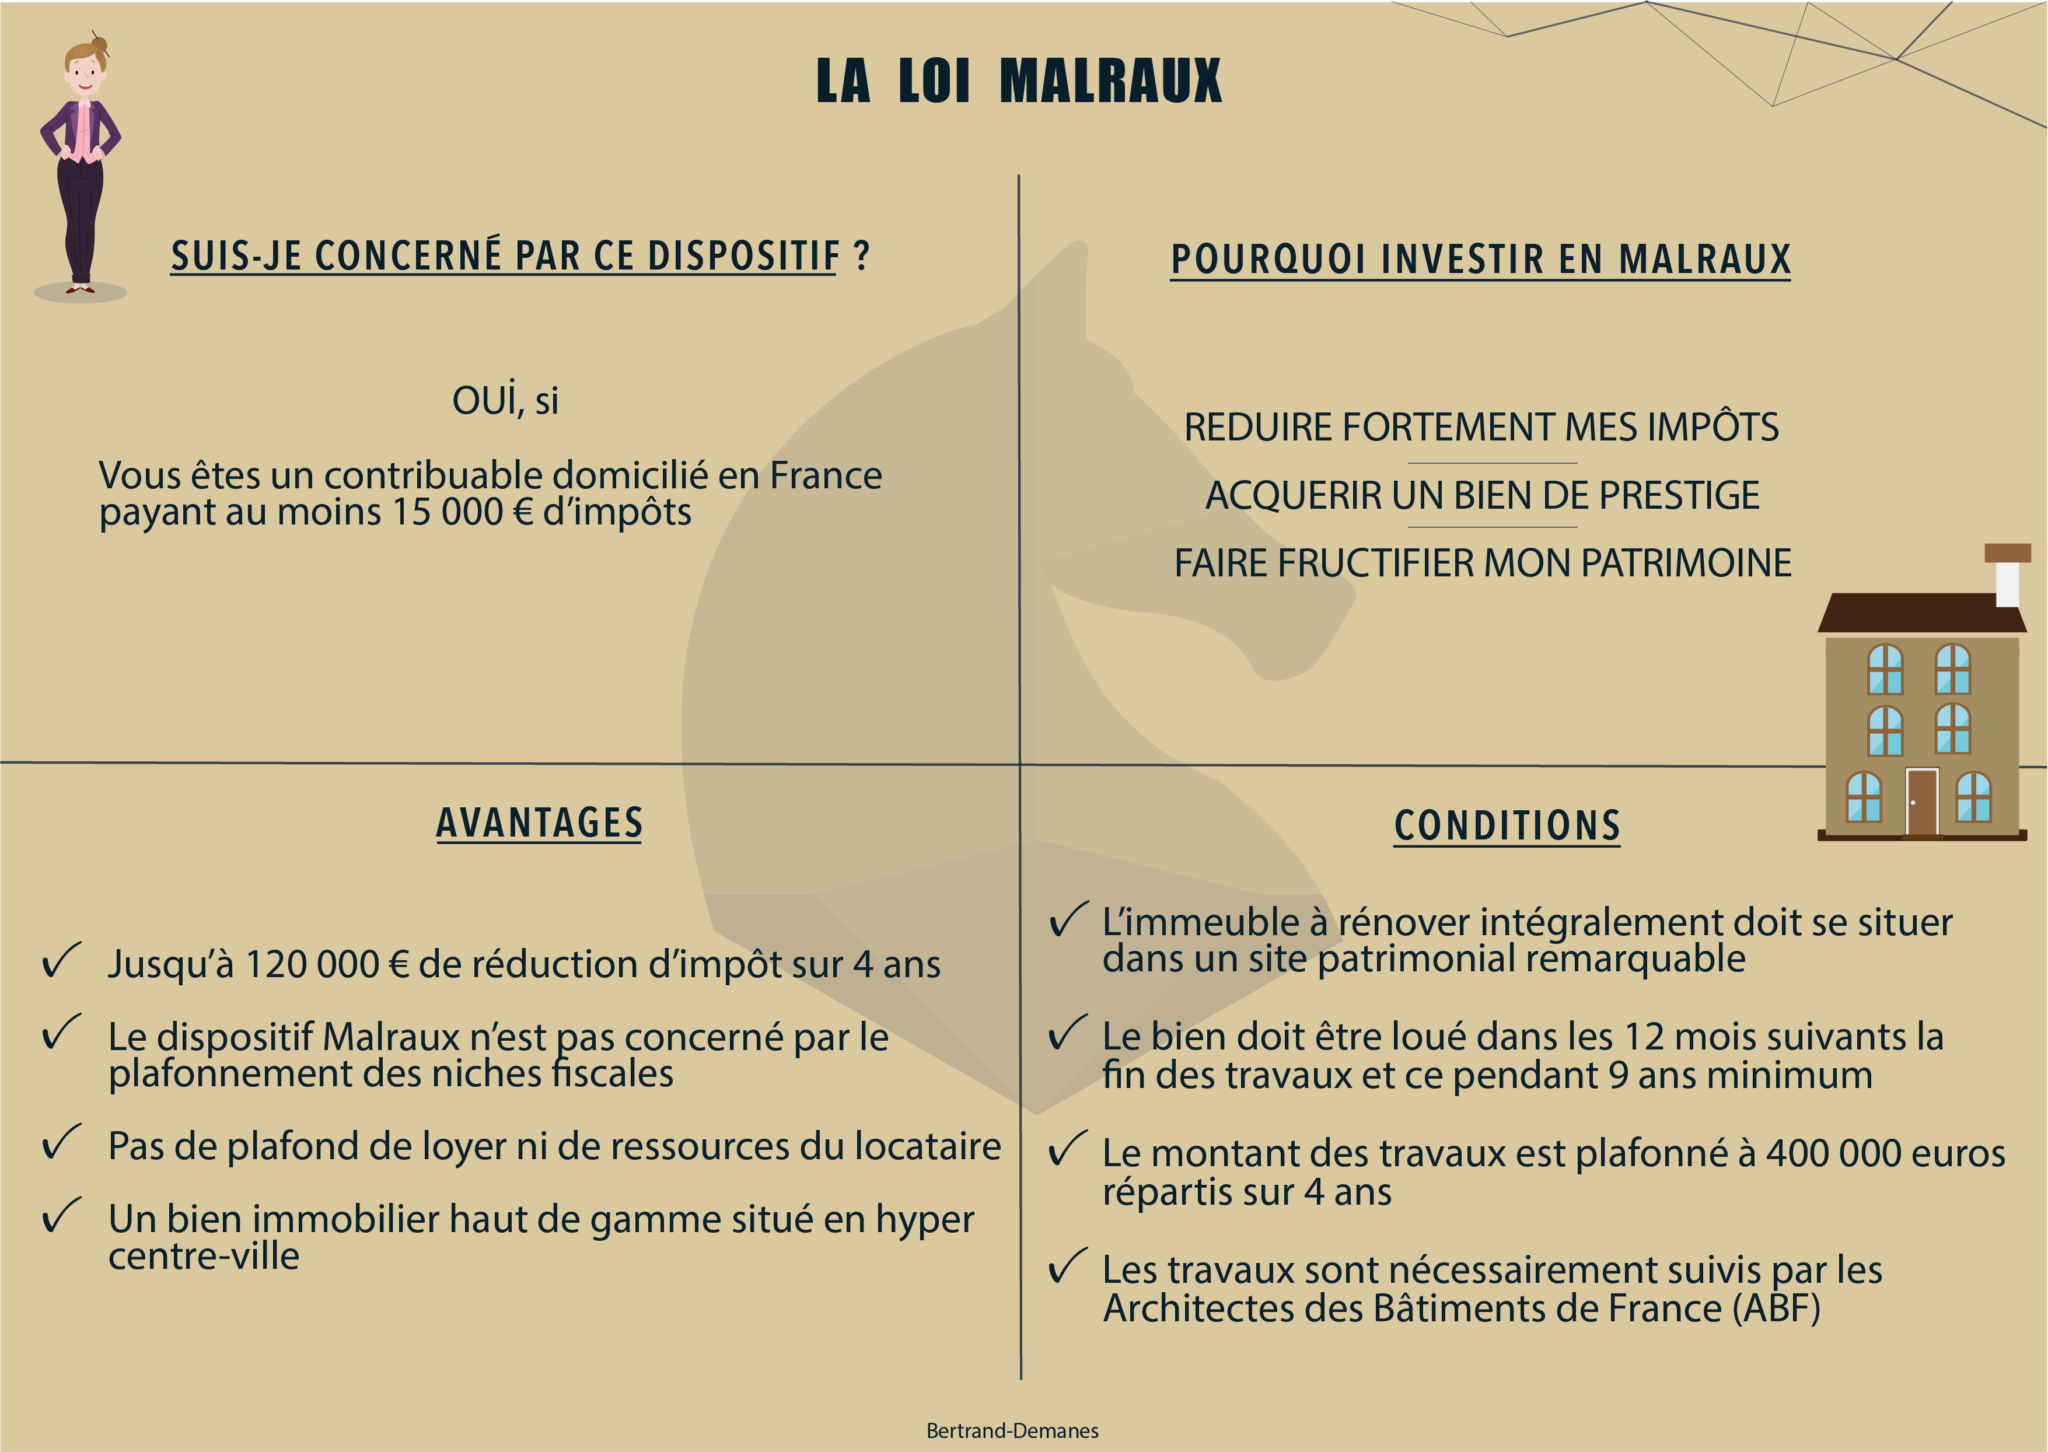 infographie-loi-malraux-lille-bertrand-demanes